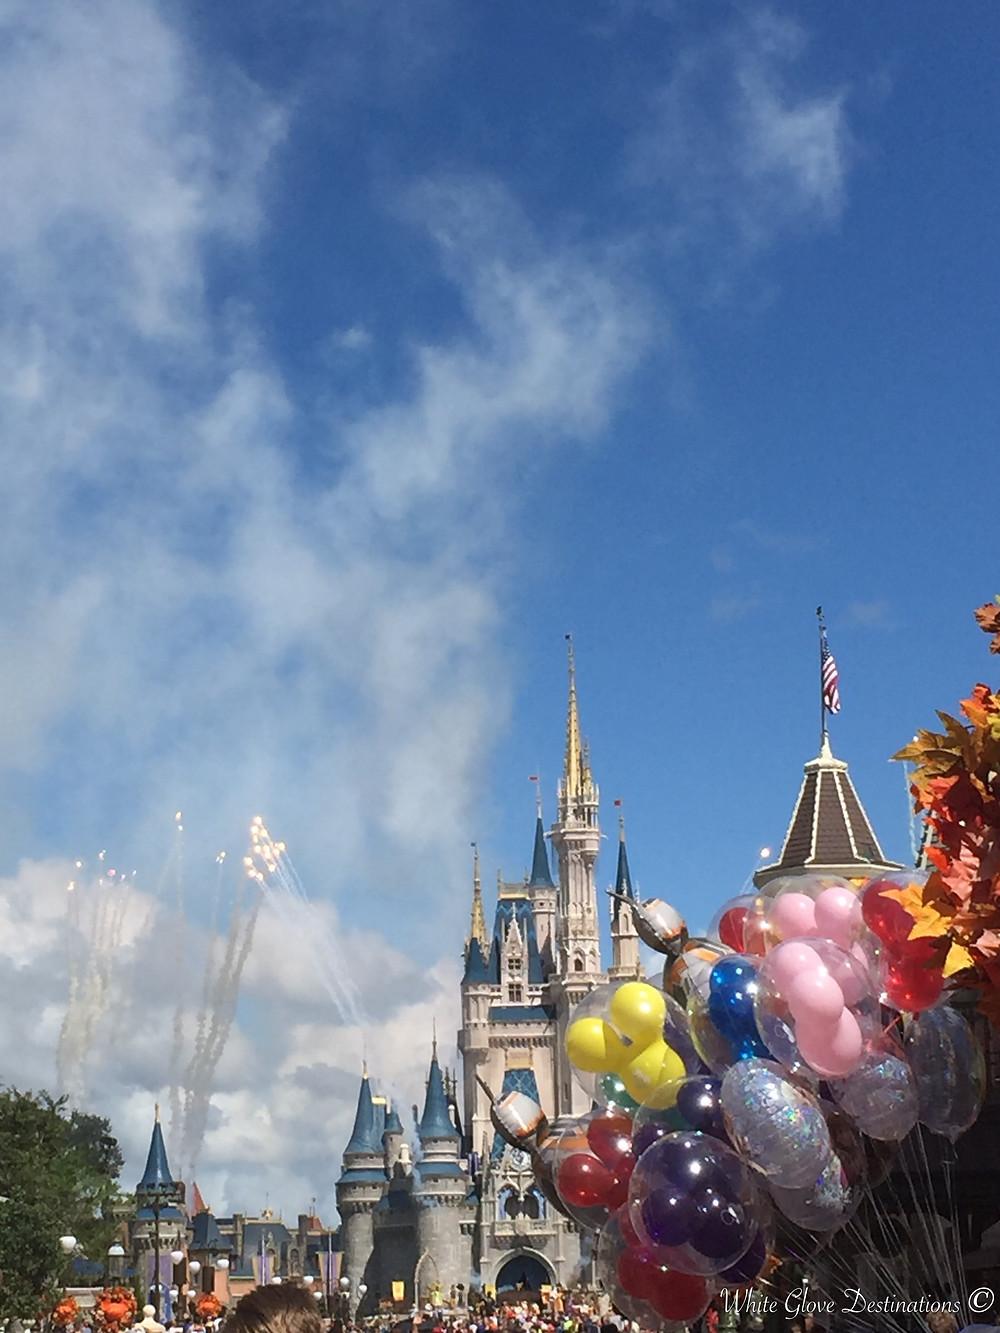 Magic at Cinderella's Castle